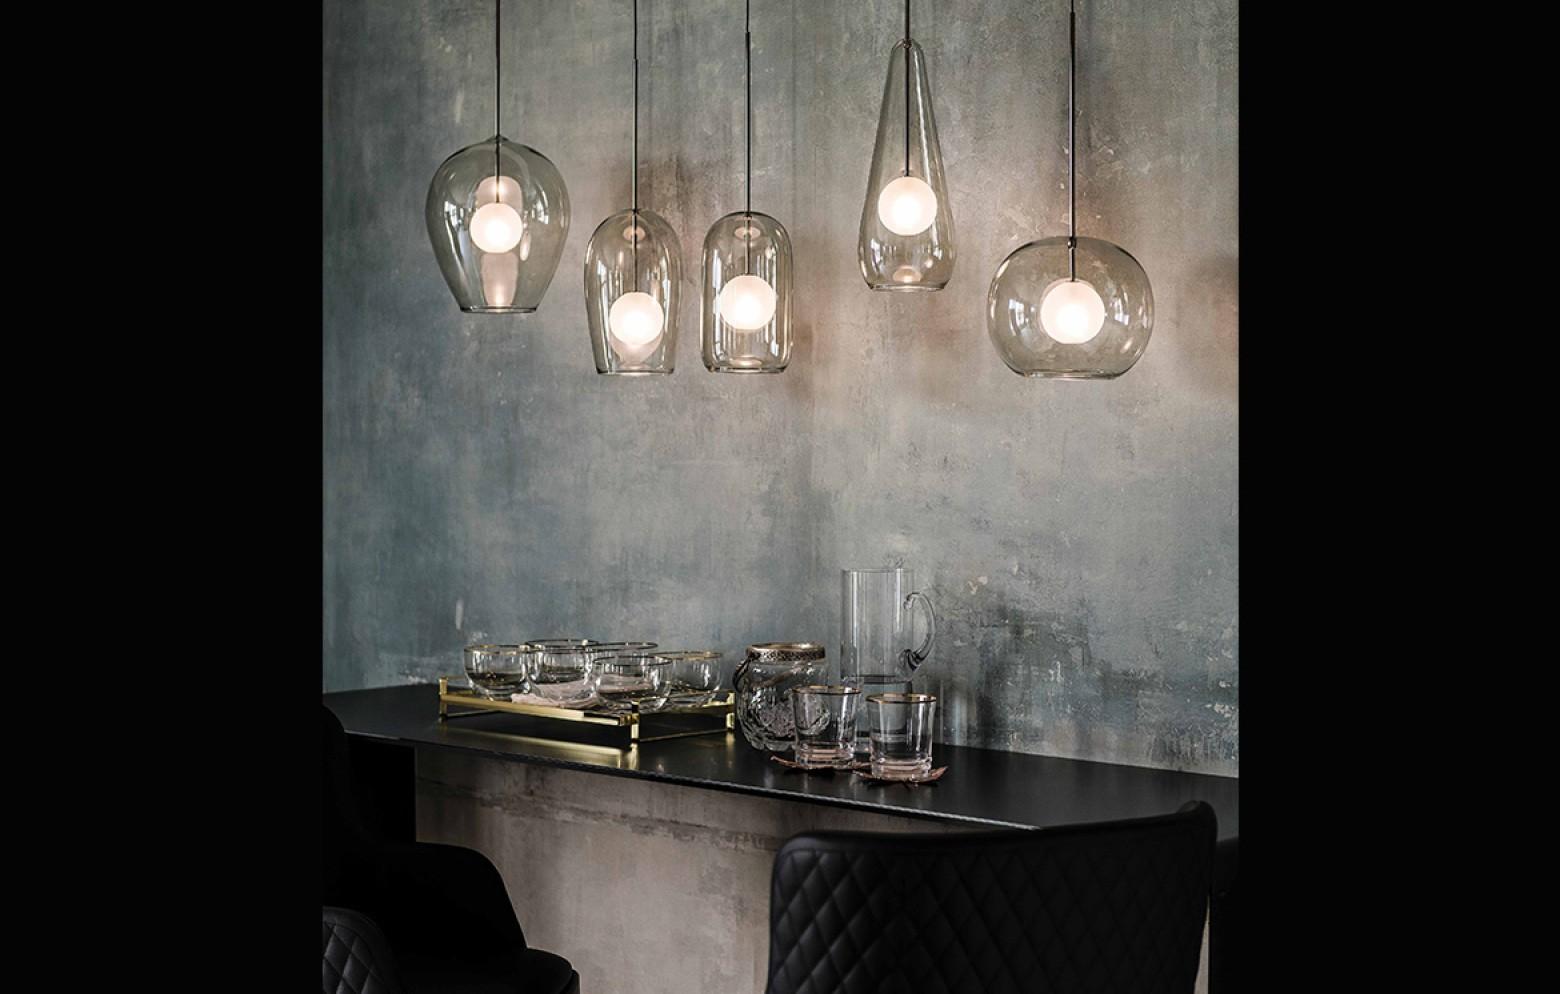 melody h ngeleuchte lampen kleinm bel accessoires who 39 s perfect. Black Bedroom Furniture Sets. Home Design Ideas